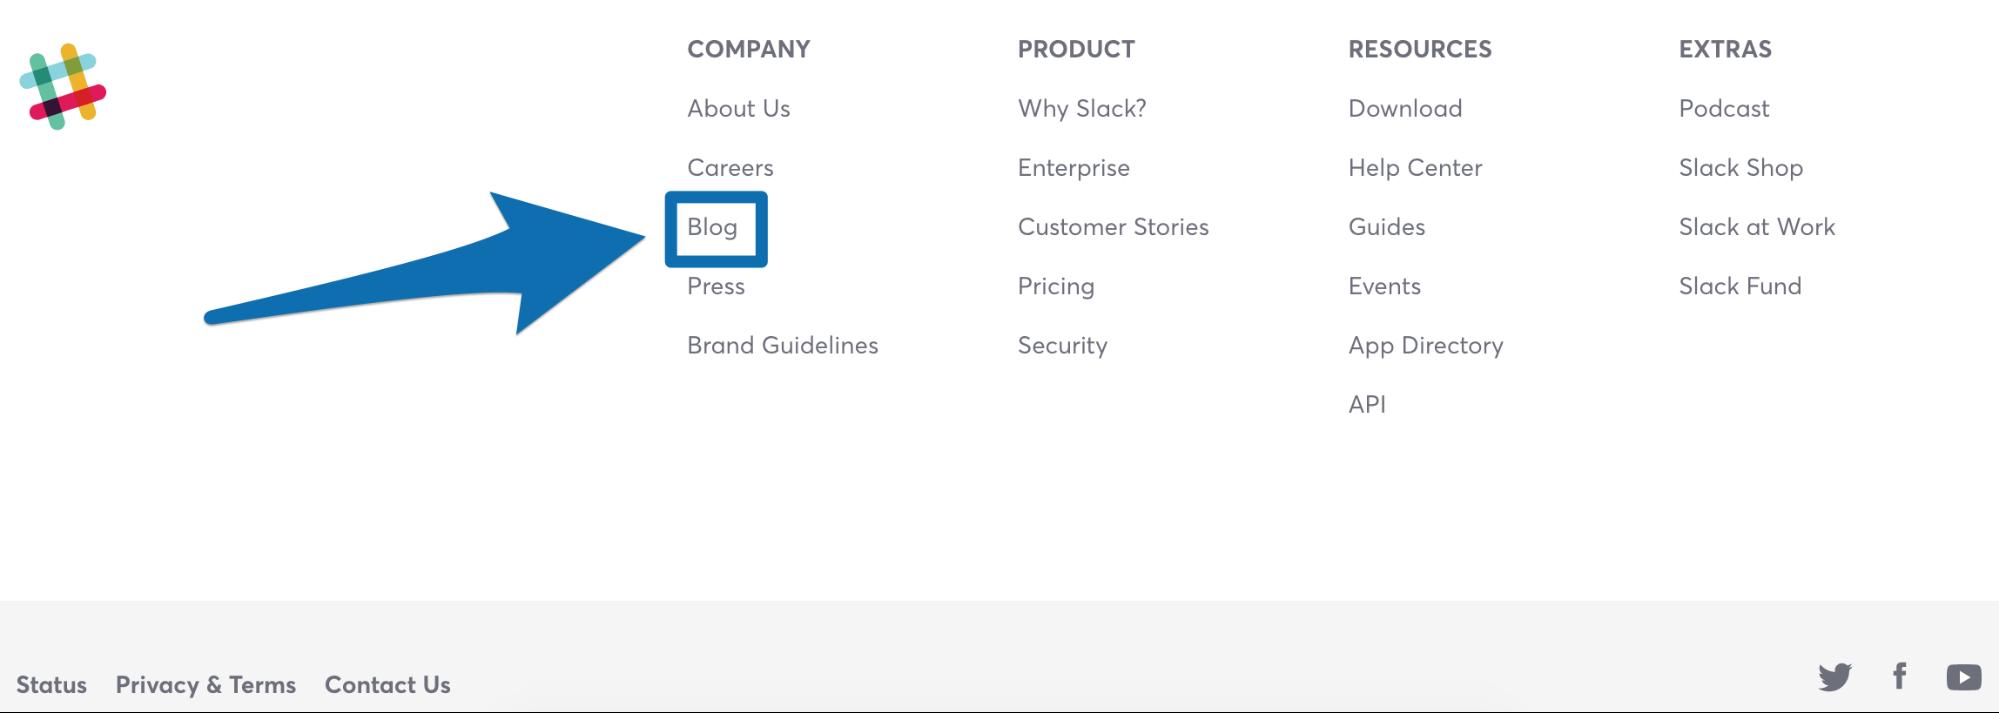 Screenshot showing a link to the Slack blog